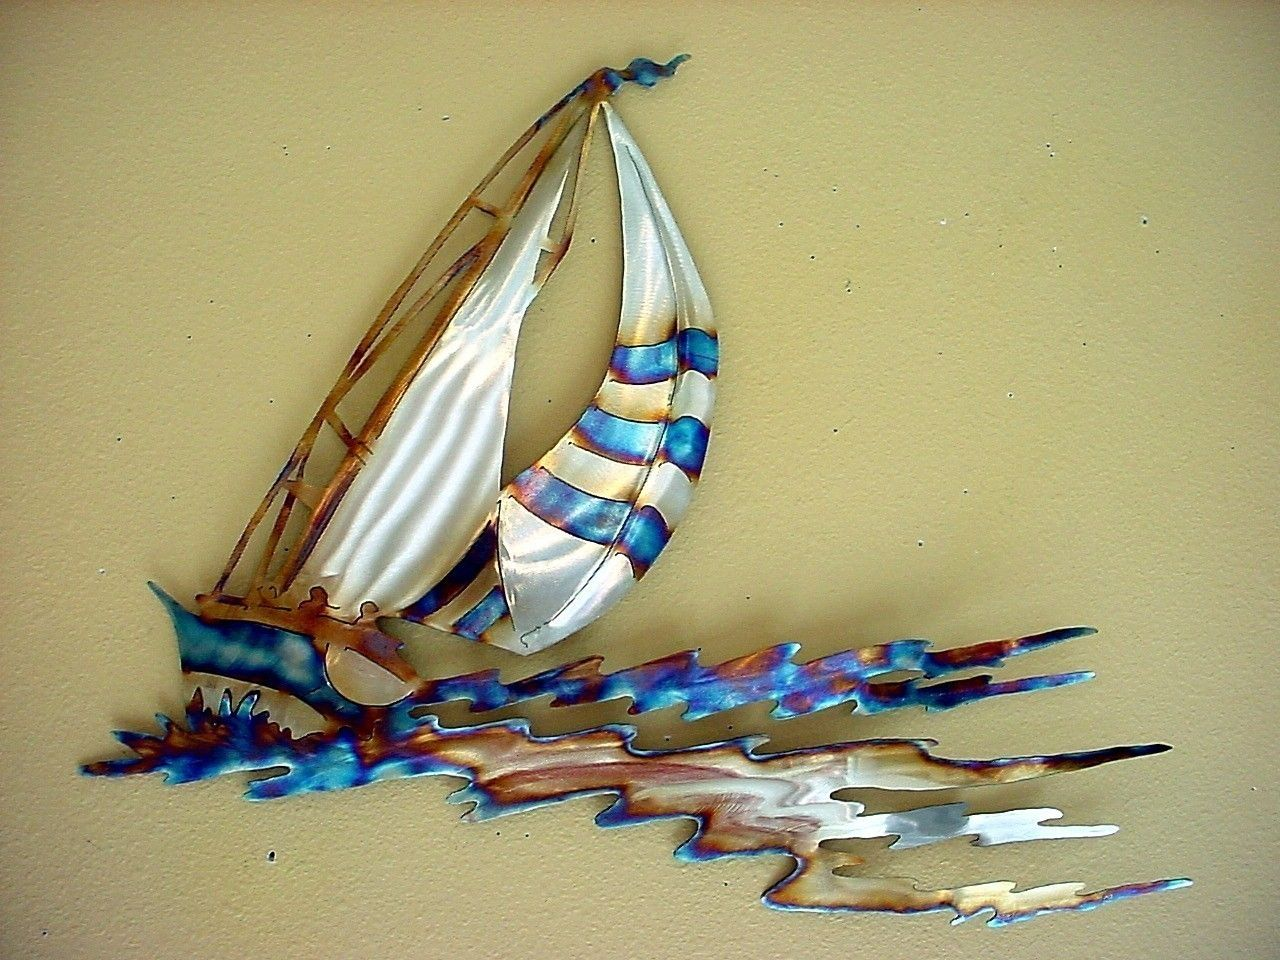 Sailboat Racing Sailor Sailing Stainless Steel Metal Wall Art Open